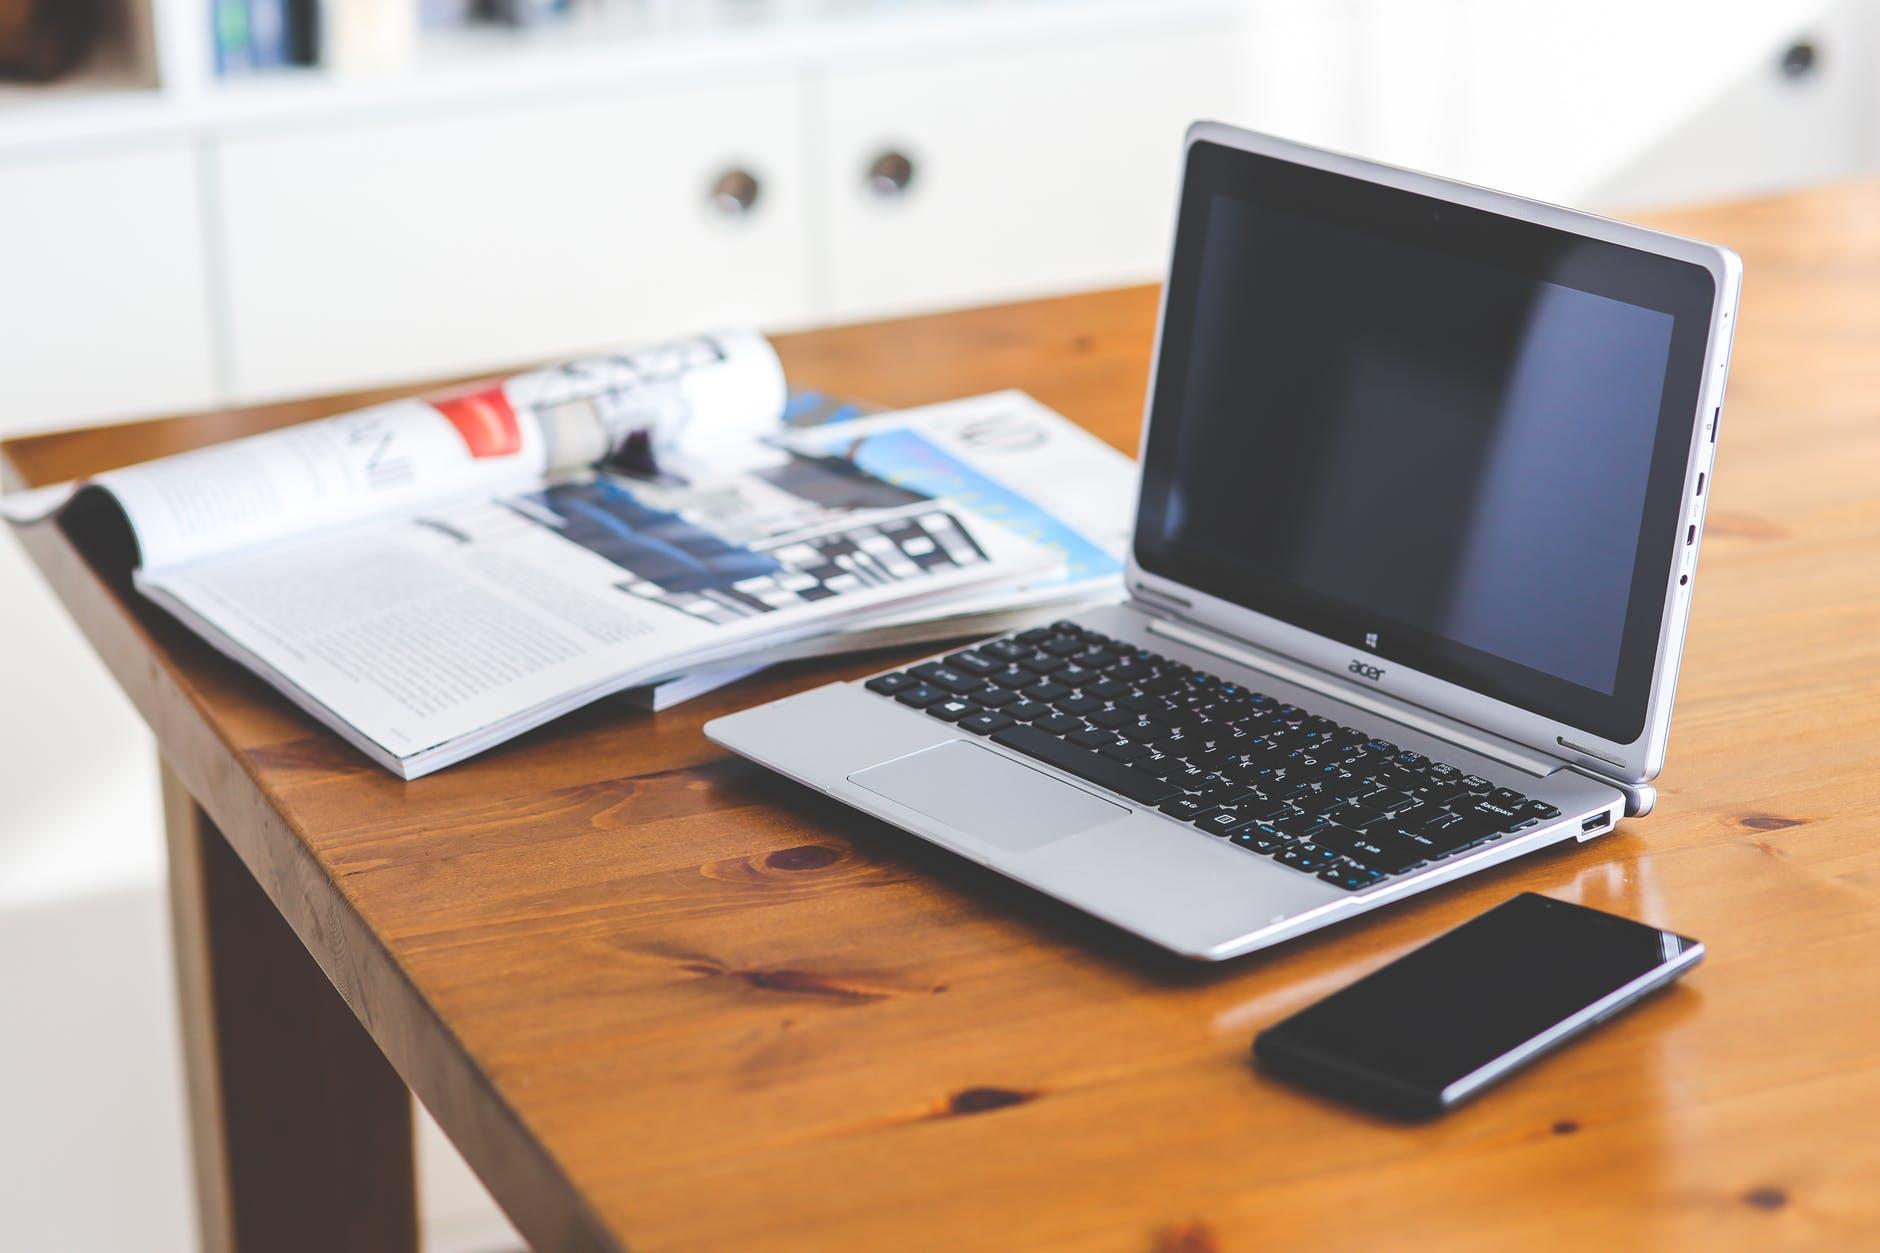 smartphone-desk-laptop-technology